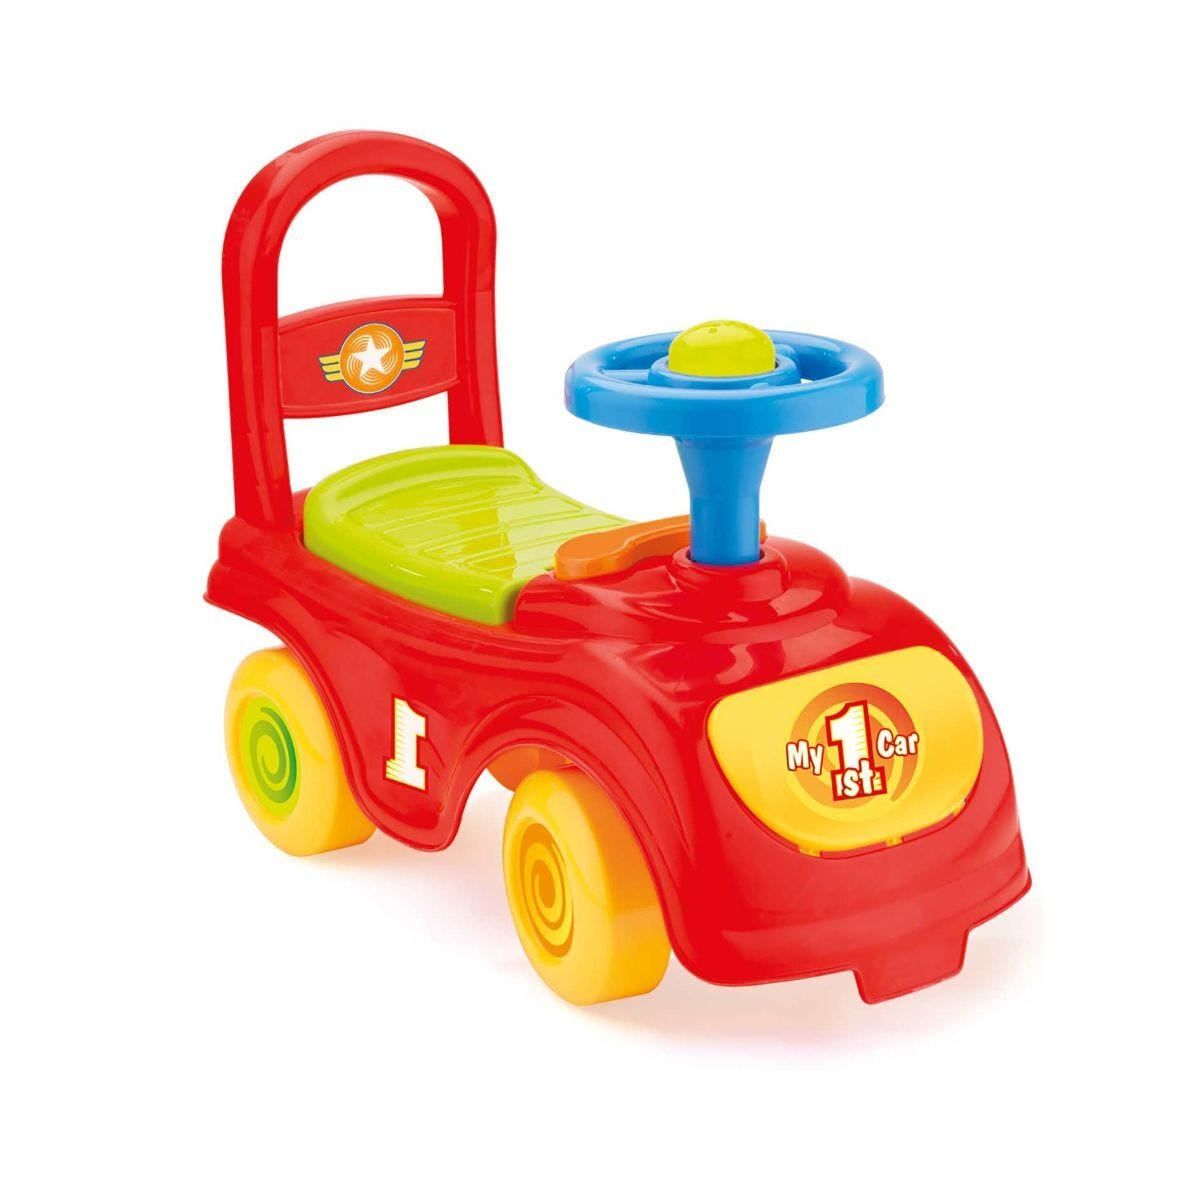 Charles Bentley Dolu Kids Push Along Sit n Ride Car with Under Seat Storage